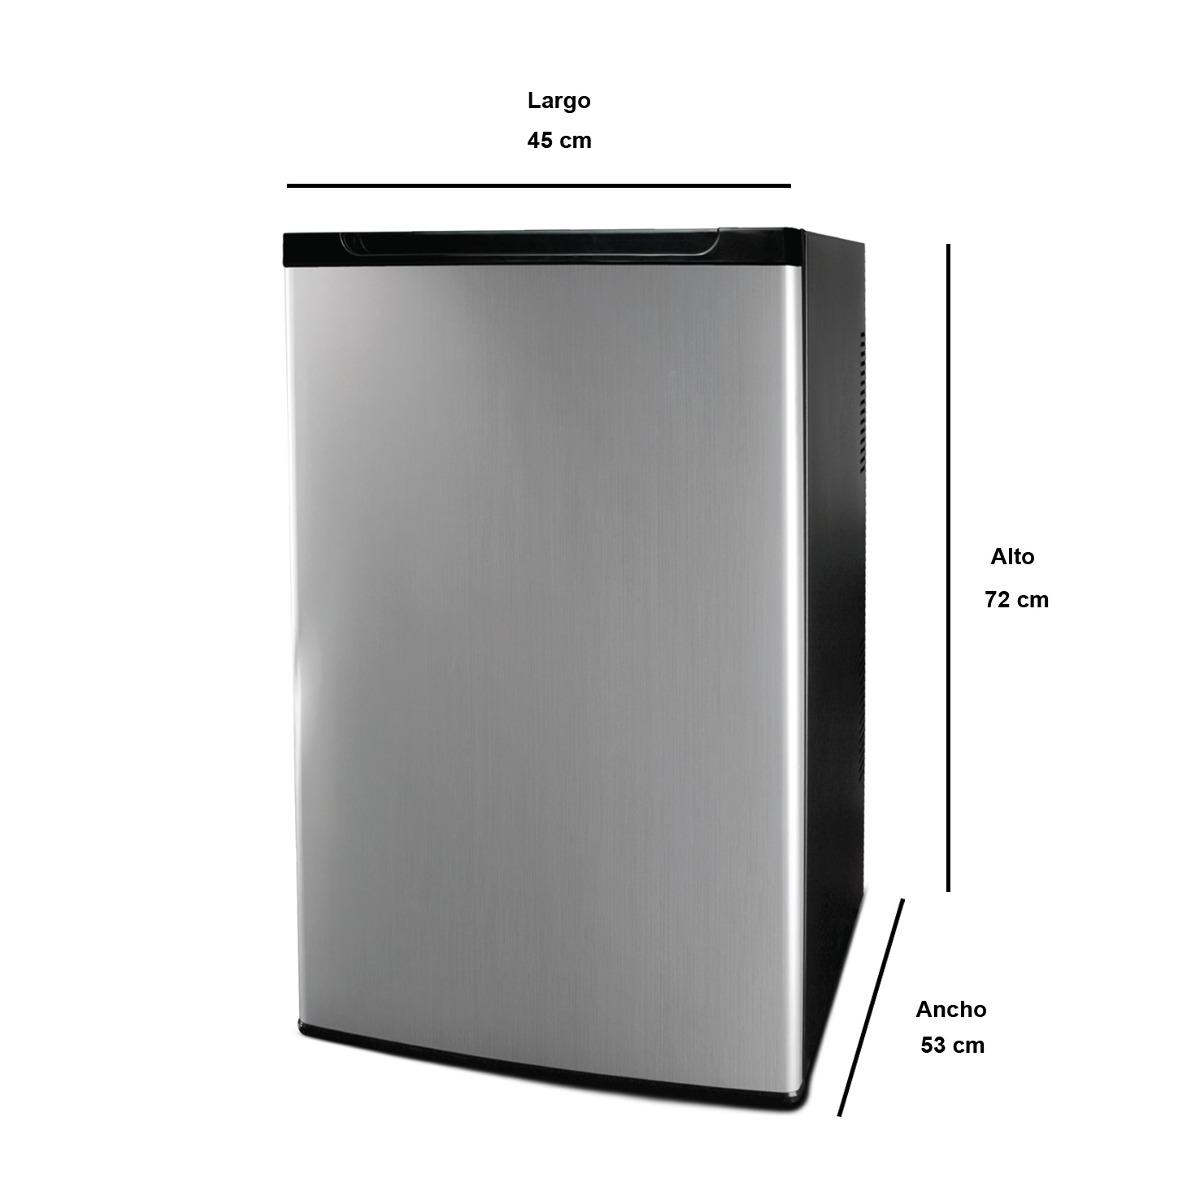 minibar frigobar minirefri refrigerador envio gratis 3 en mercado libre. Black Bedroom Furniture Sets. Home Design Ideas